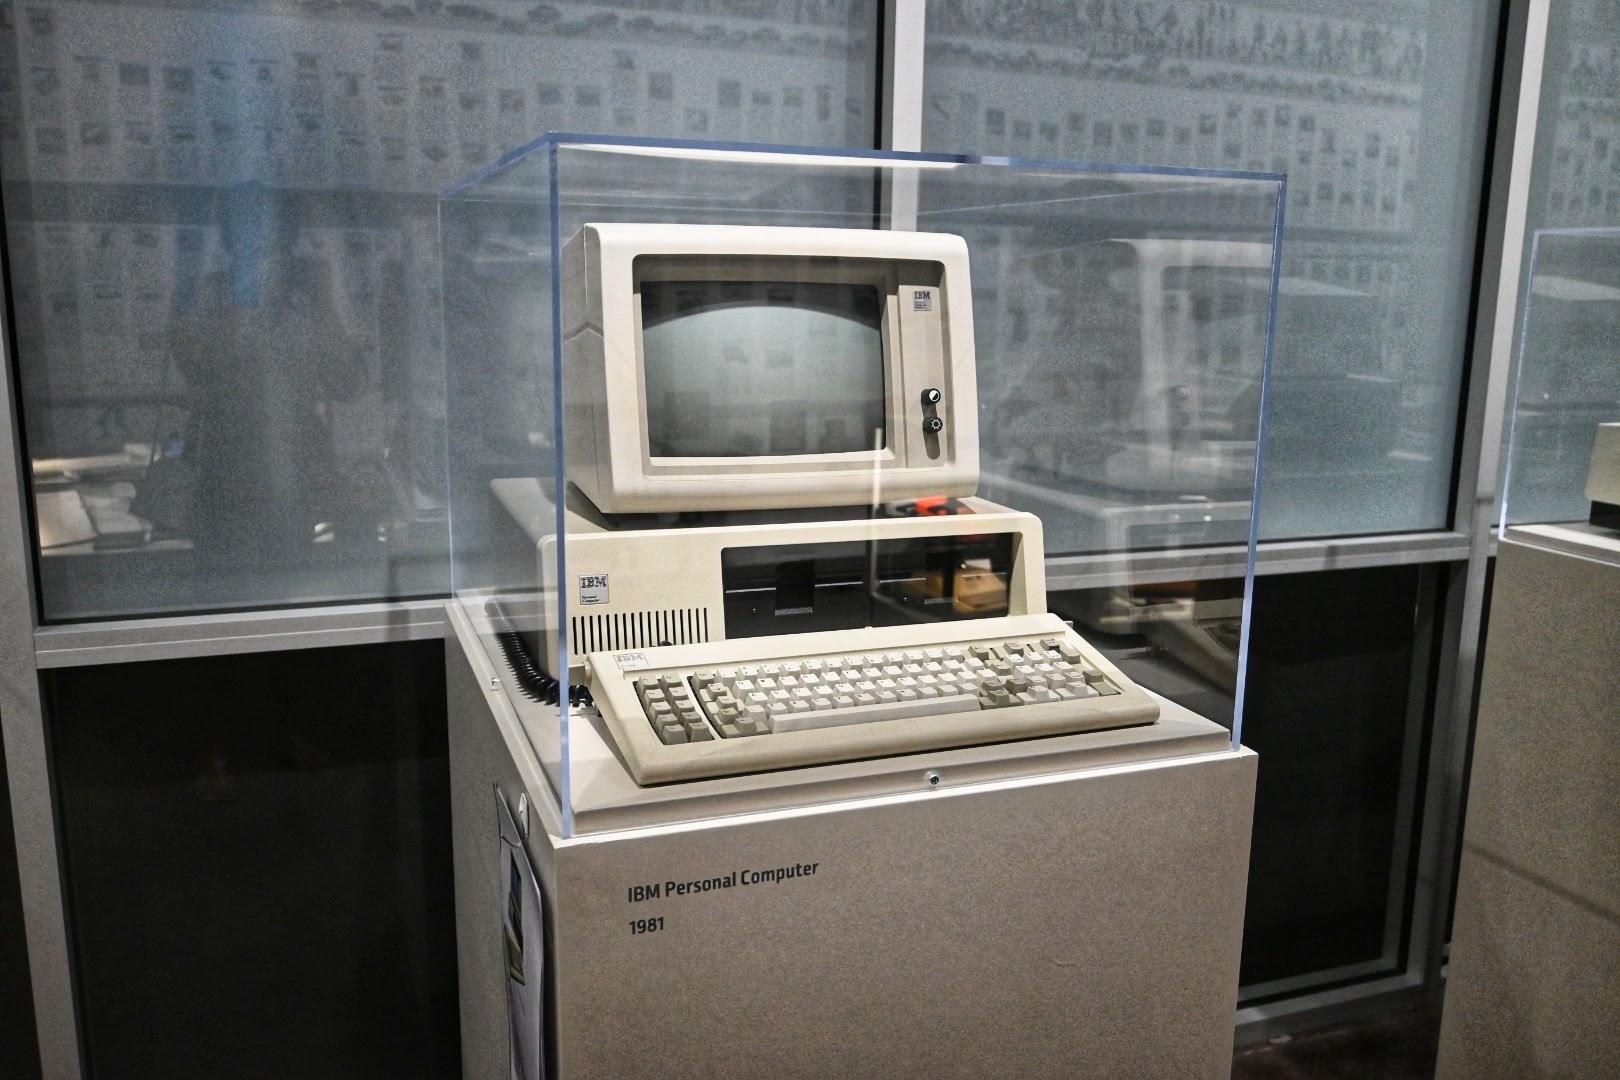 IBM Personal Computer 1981